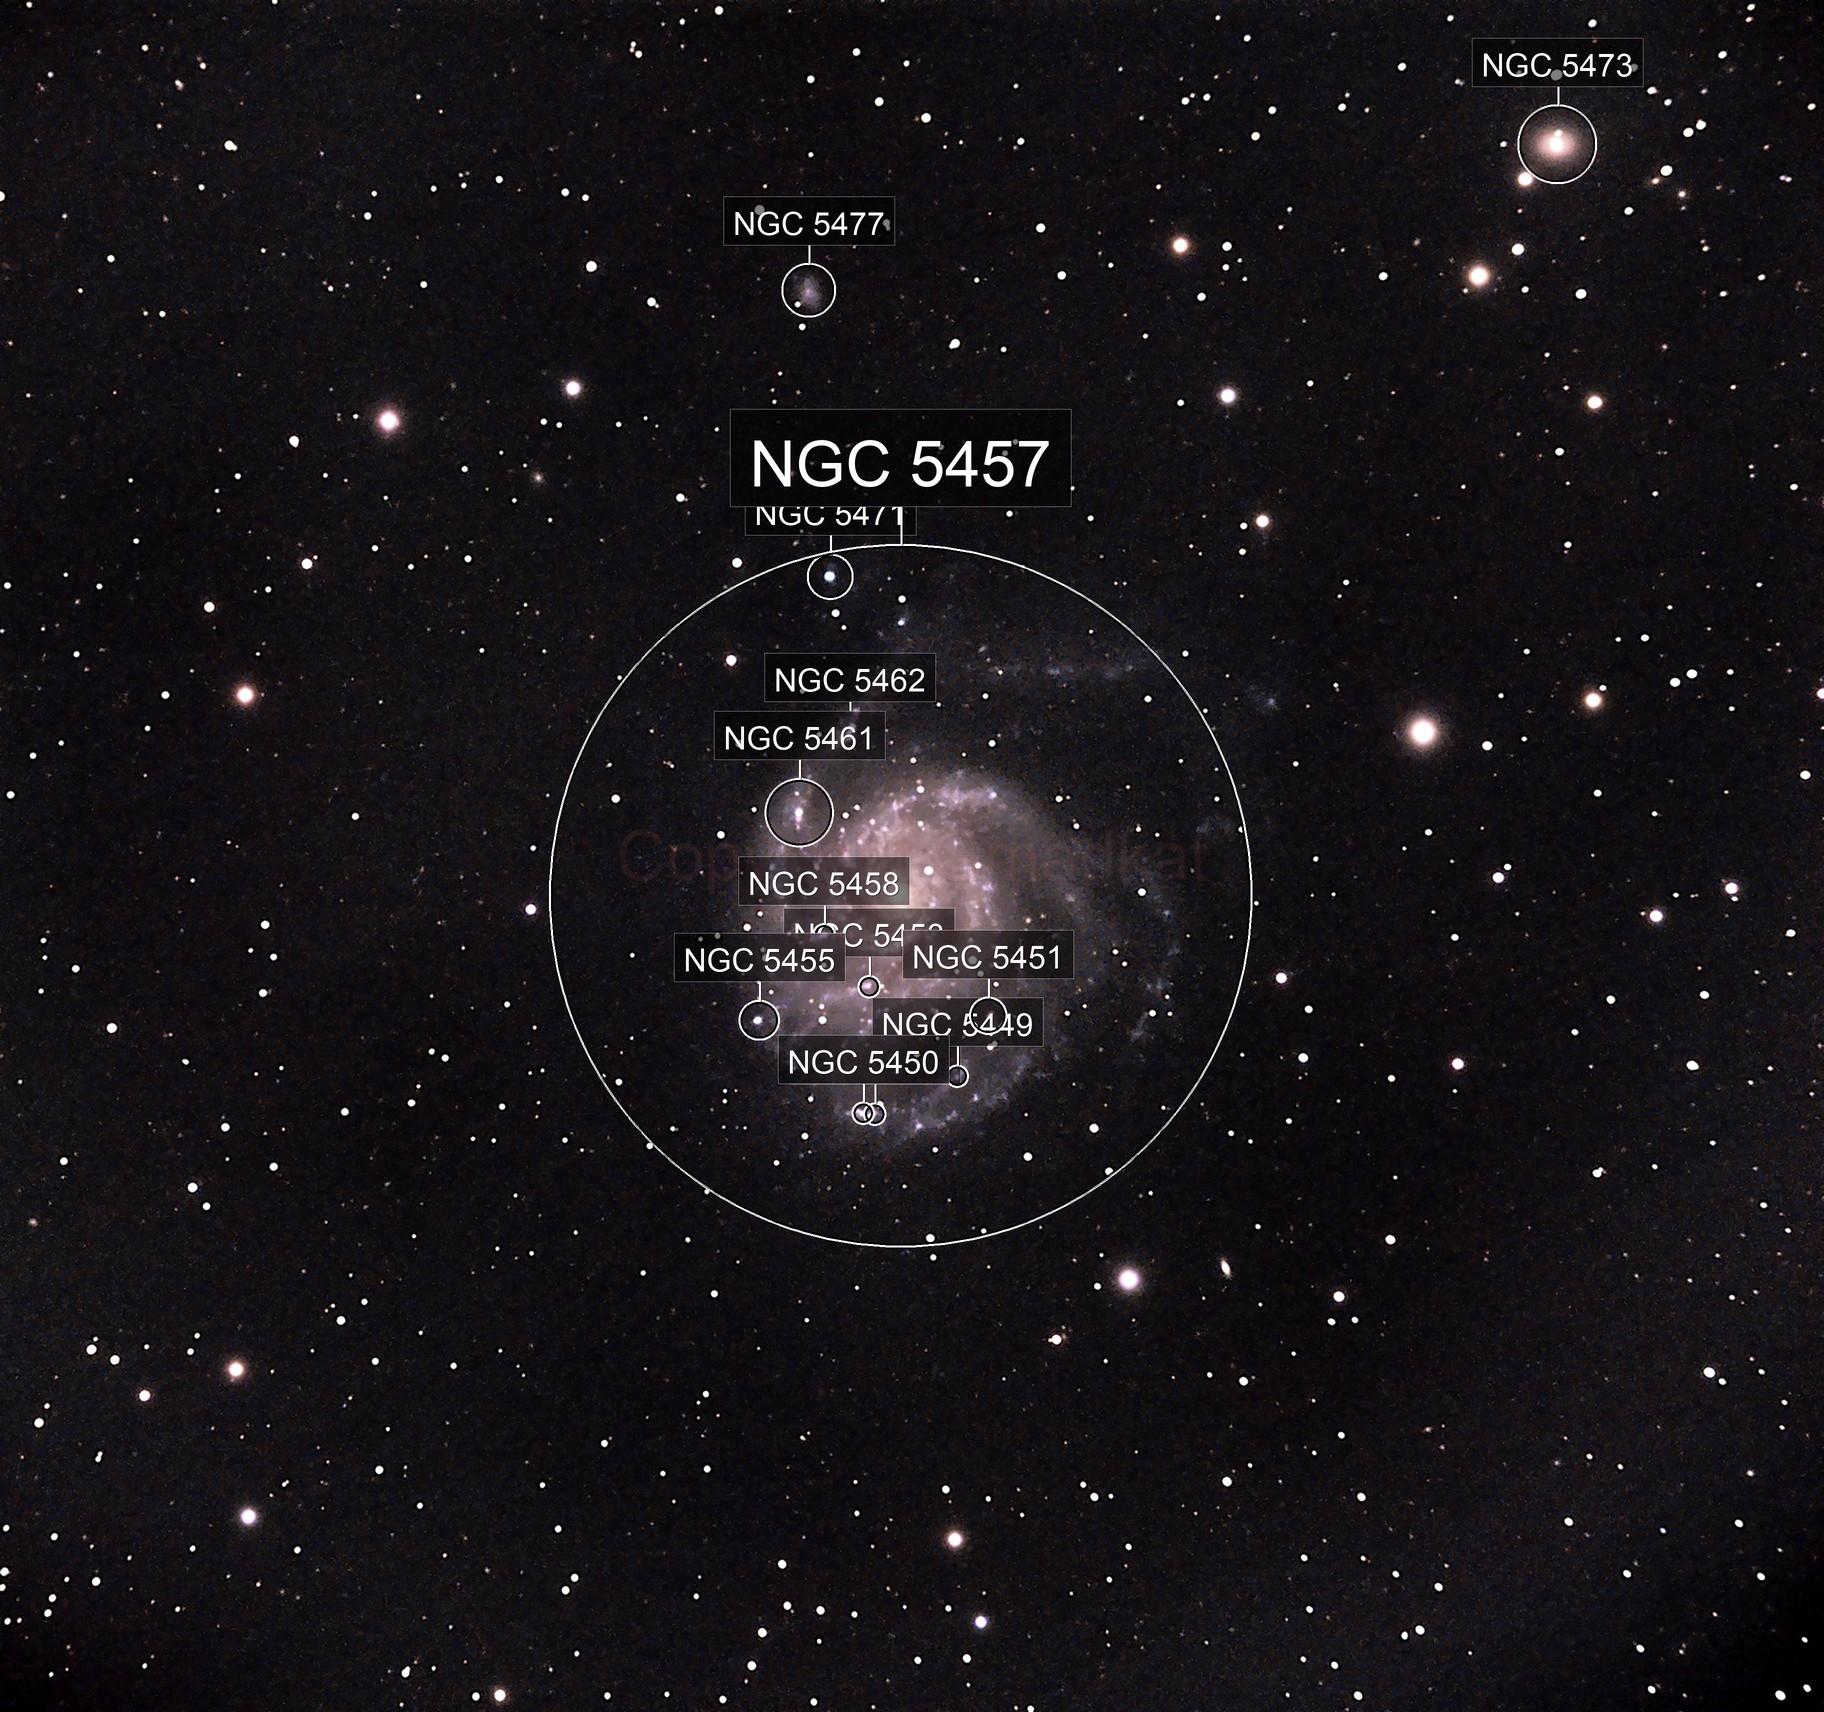 M101(Pinwheel Galaxy) in progress